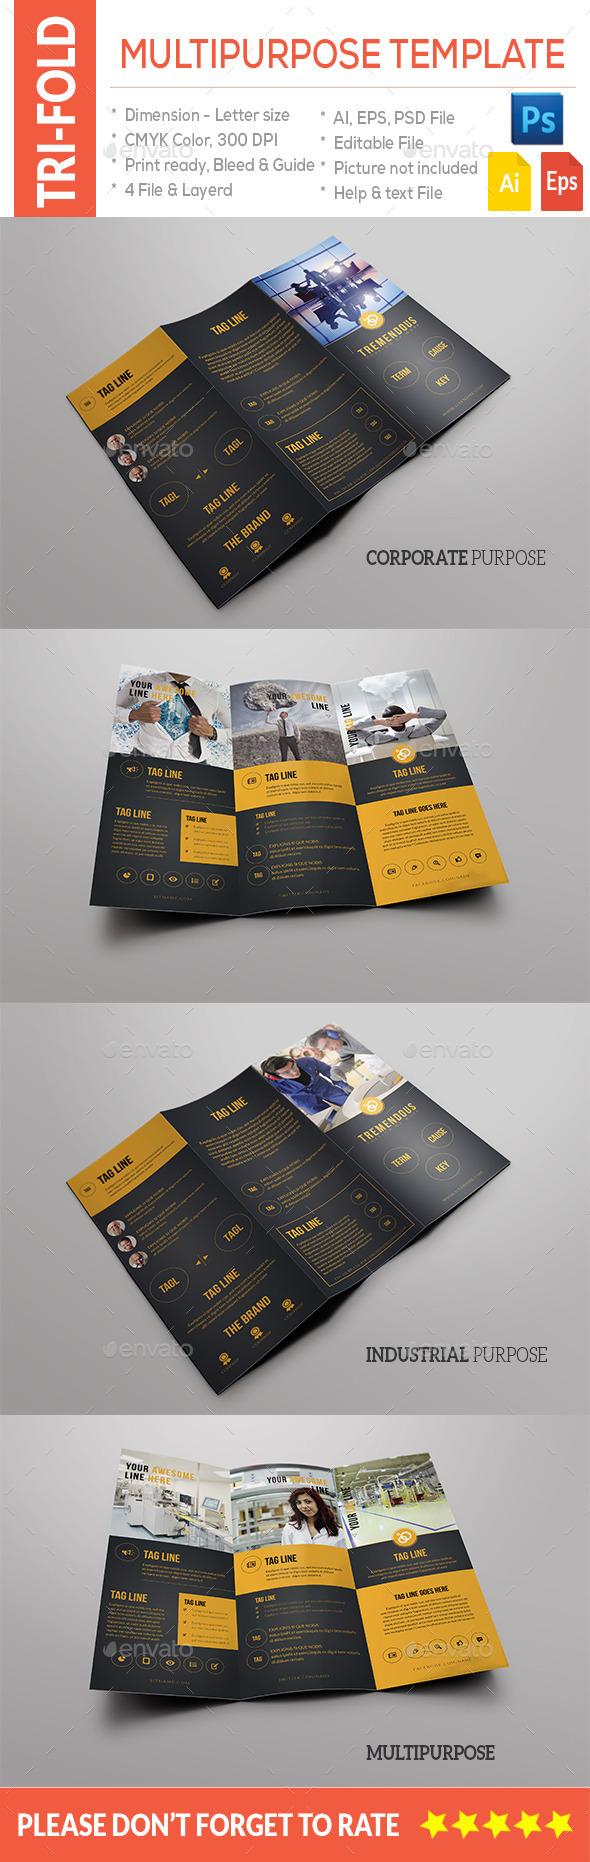 Multipurpose Tri-Fold Template - Brochures Print Templates